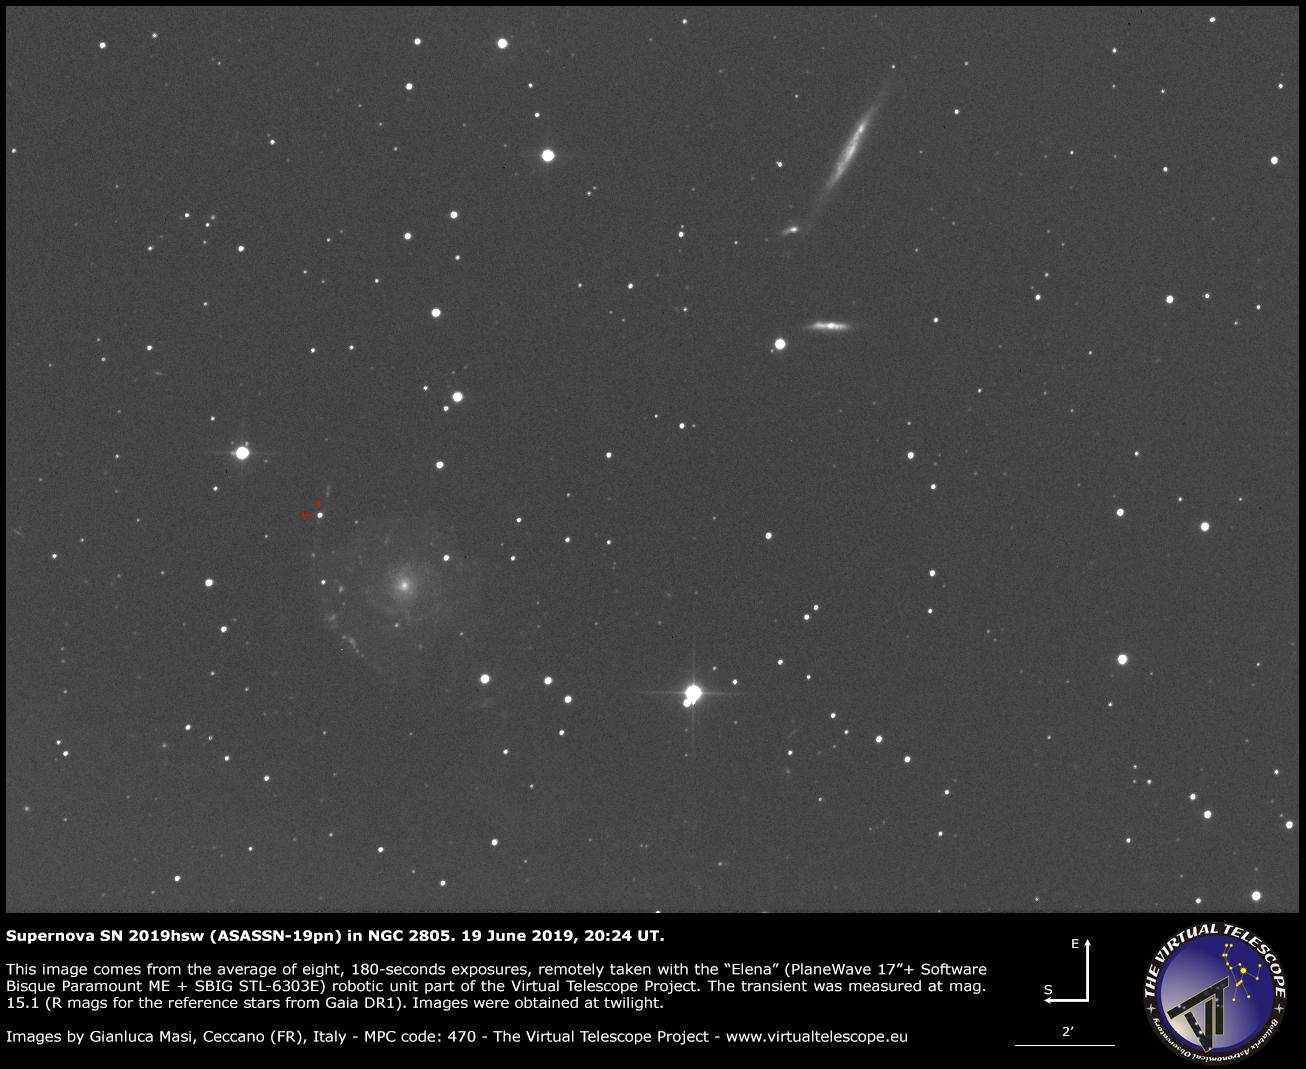 Supernova SN 2019hsw in NGC 2805: 19 June 2019